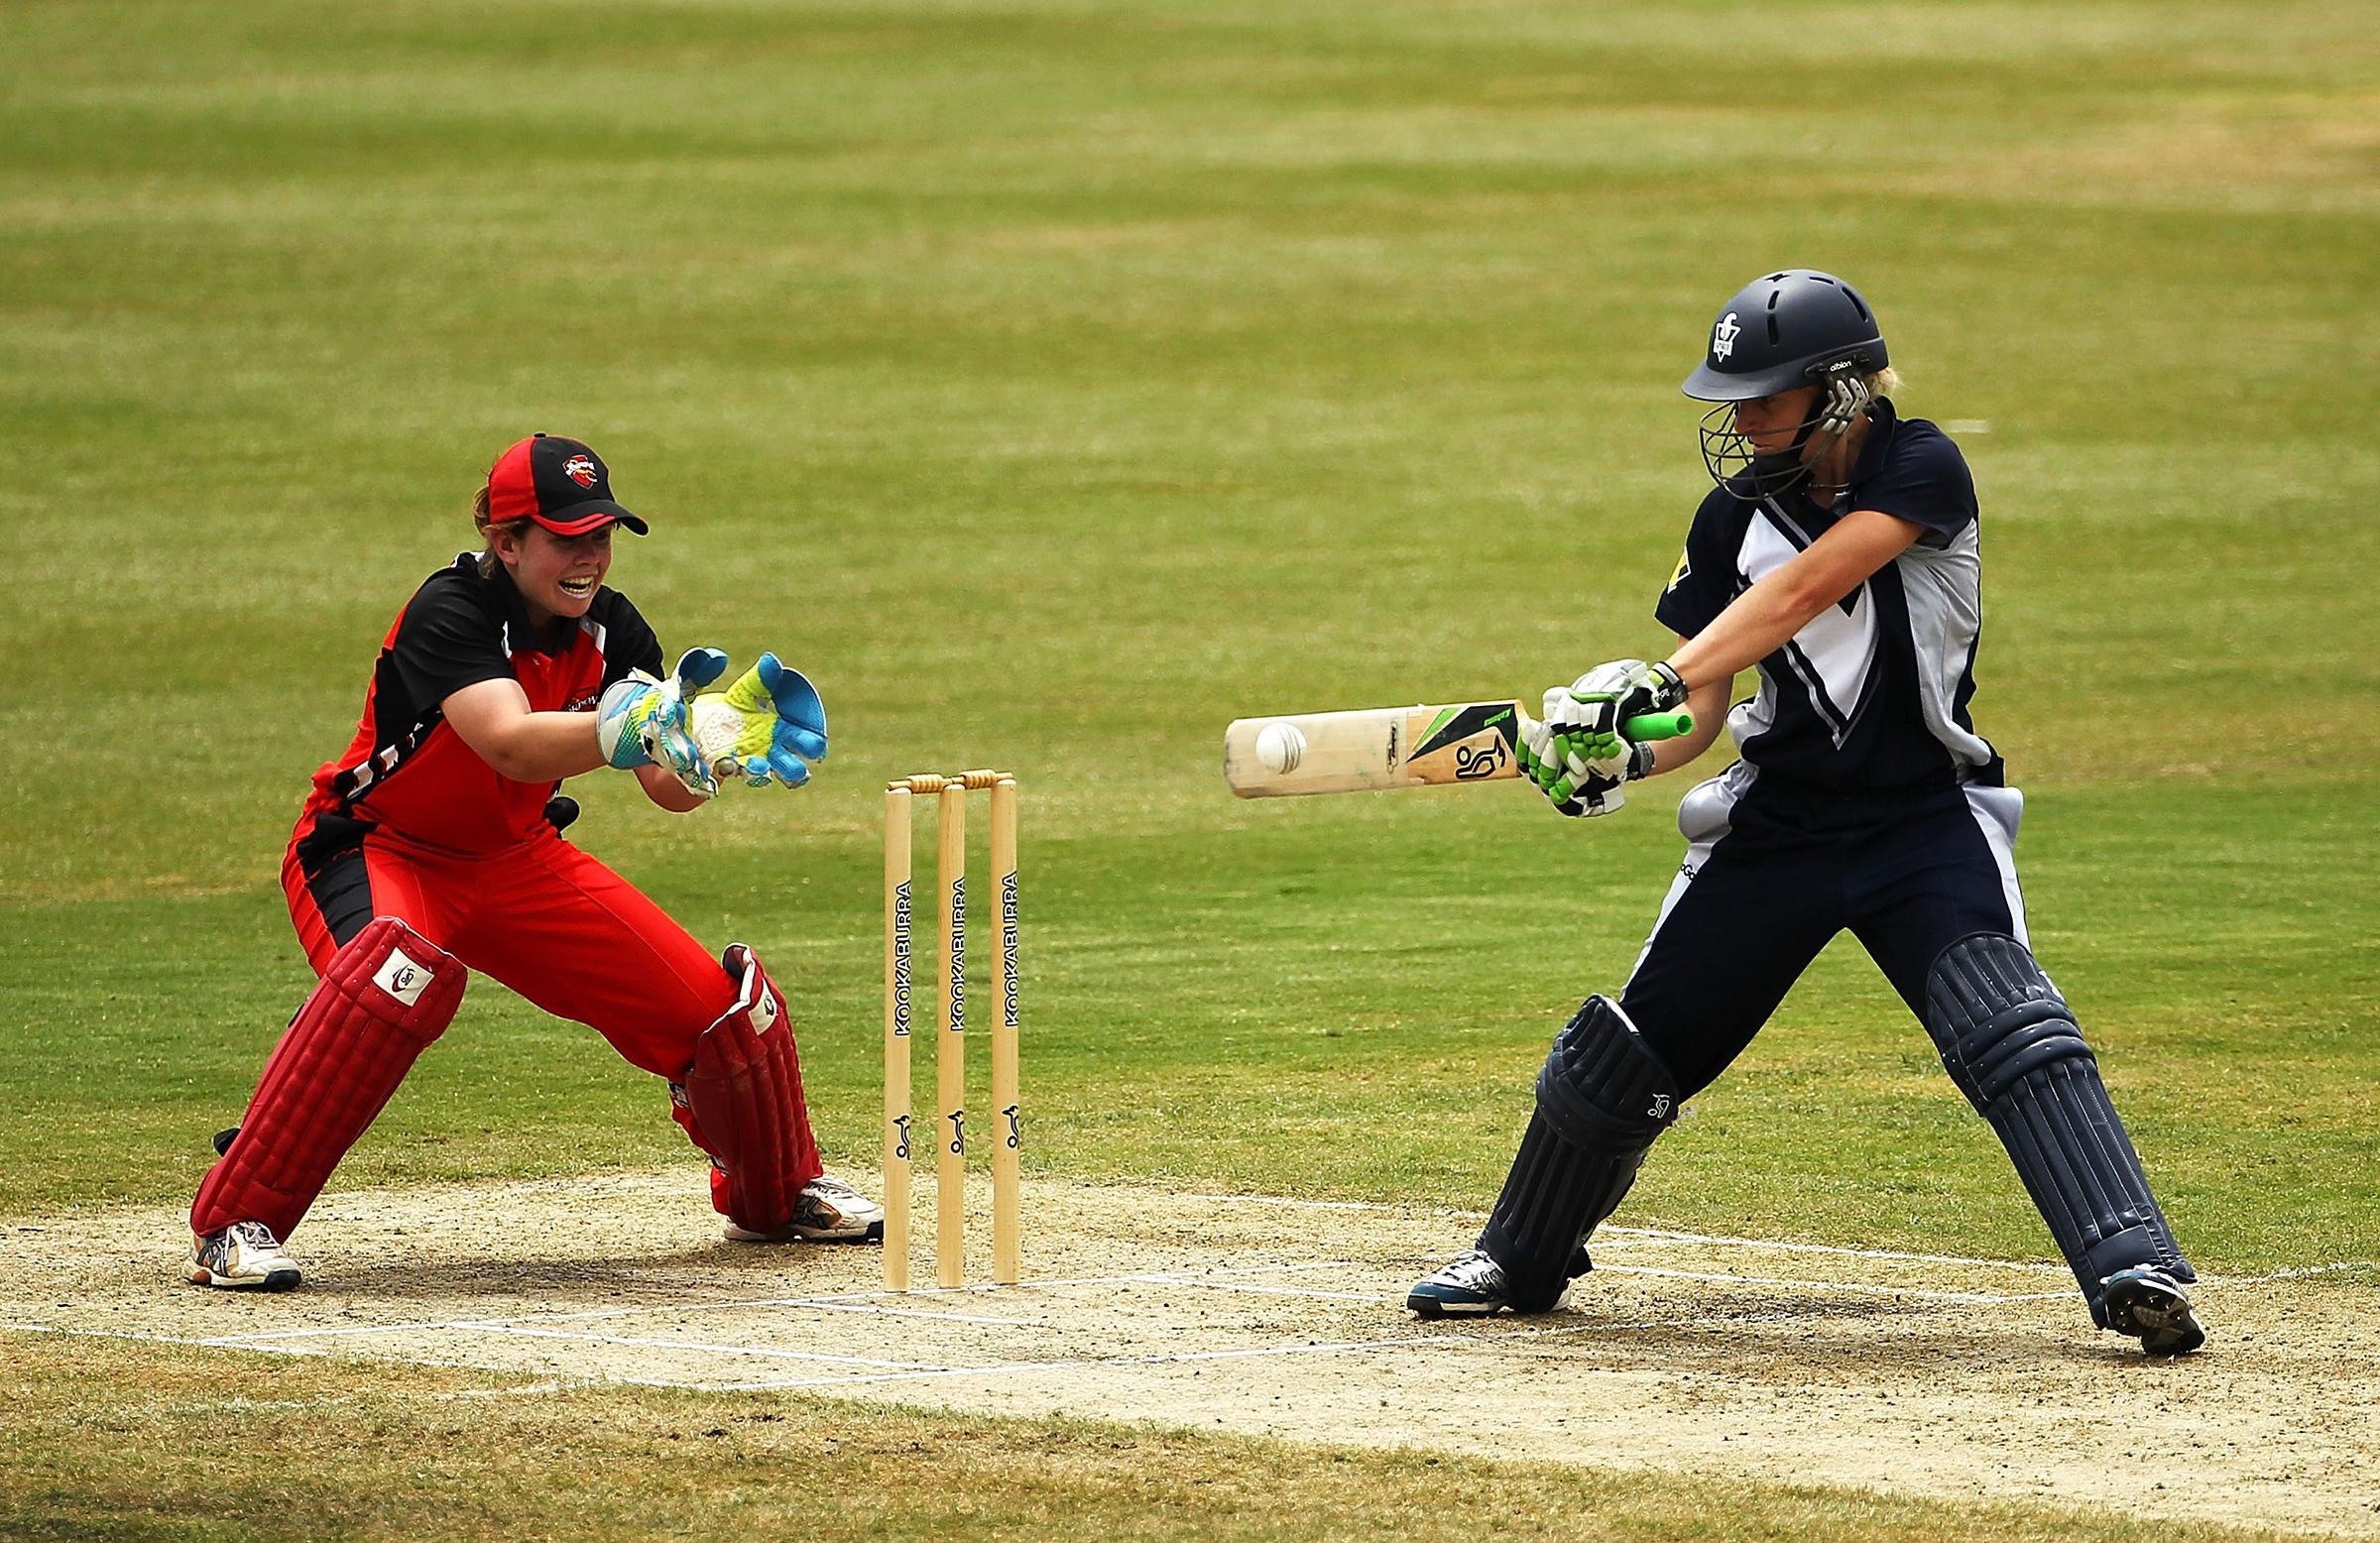 Elyse Villani cuts loose against South Australia in 2012 // Getty